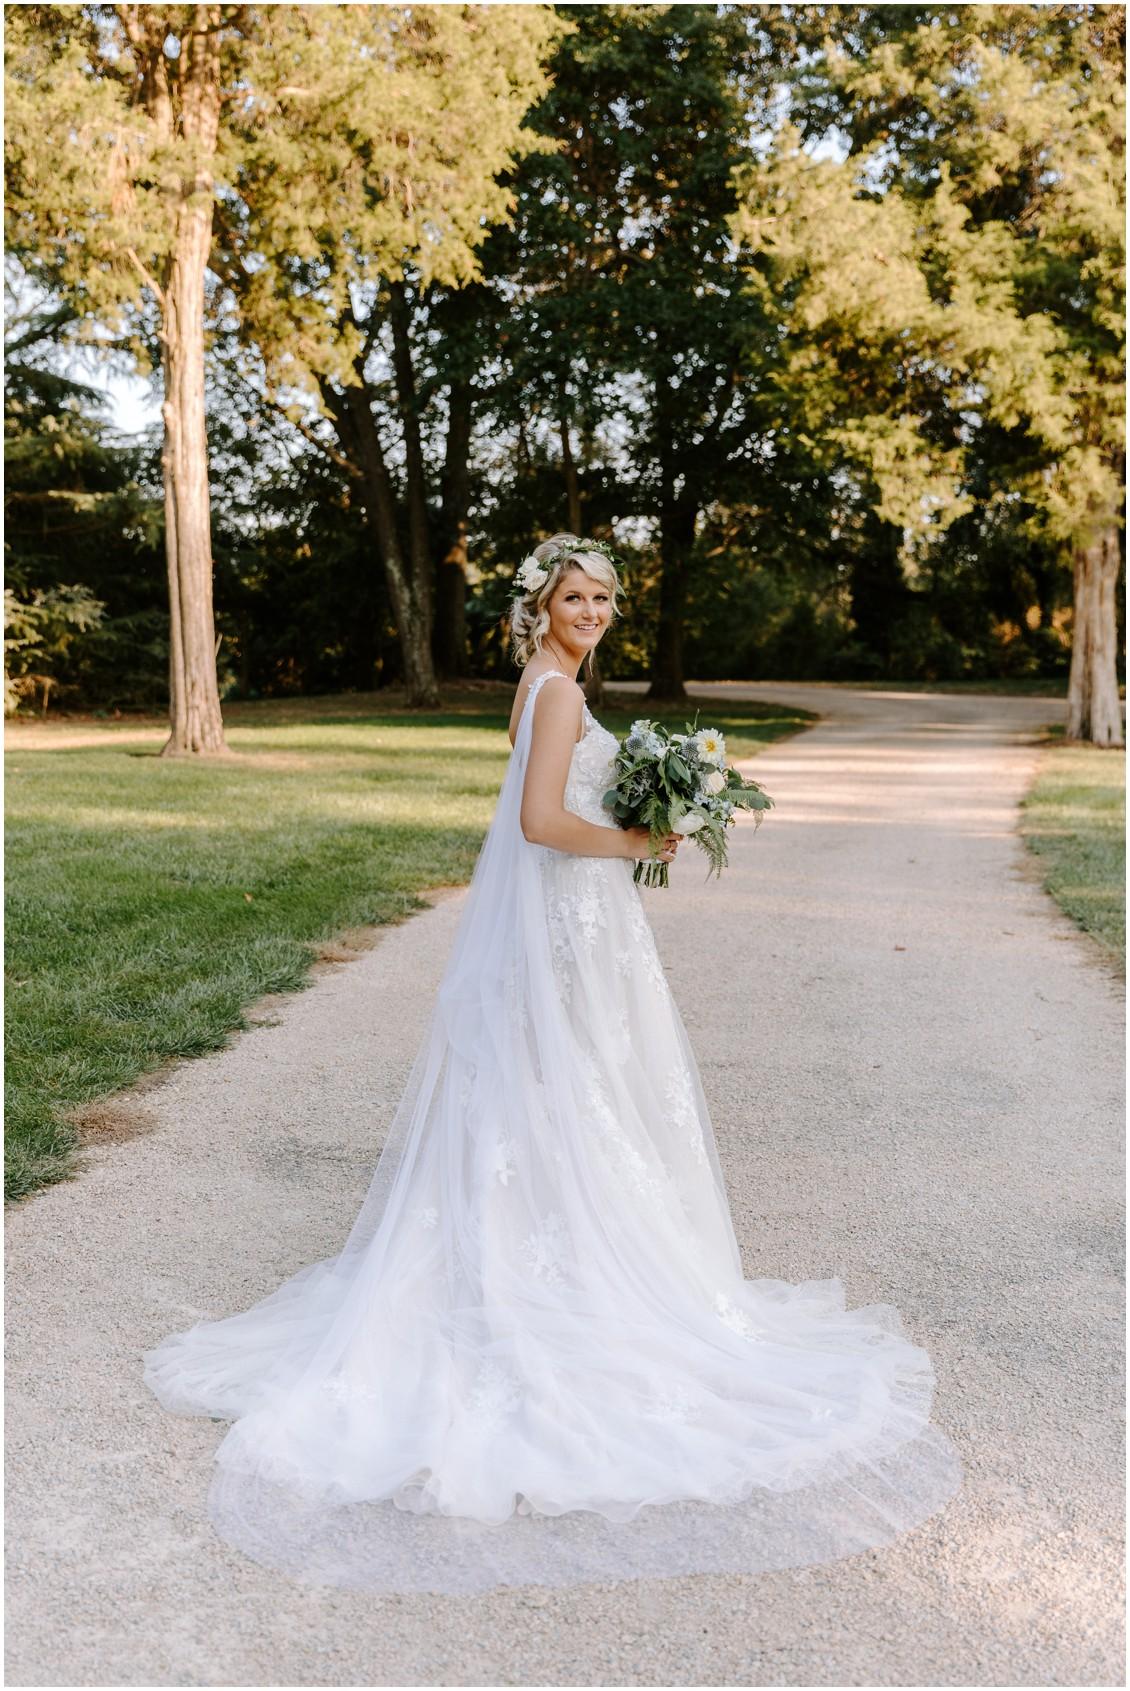 Bridal portrait with bouquet | My Eastern Shore Wedding | Sherwood Florist |